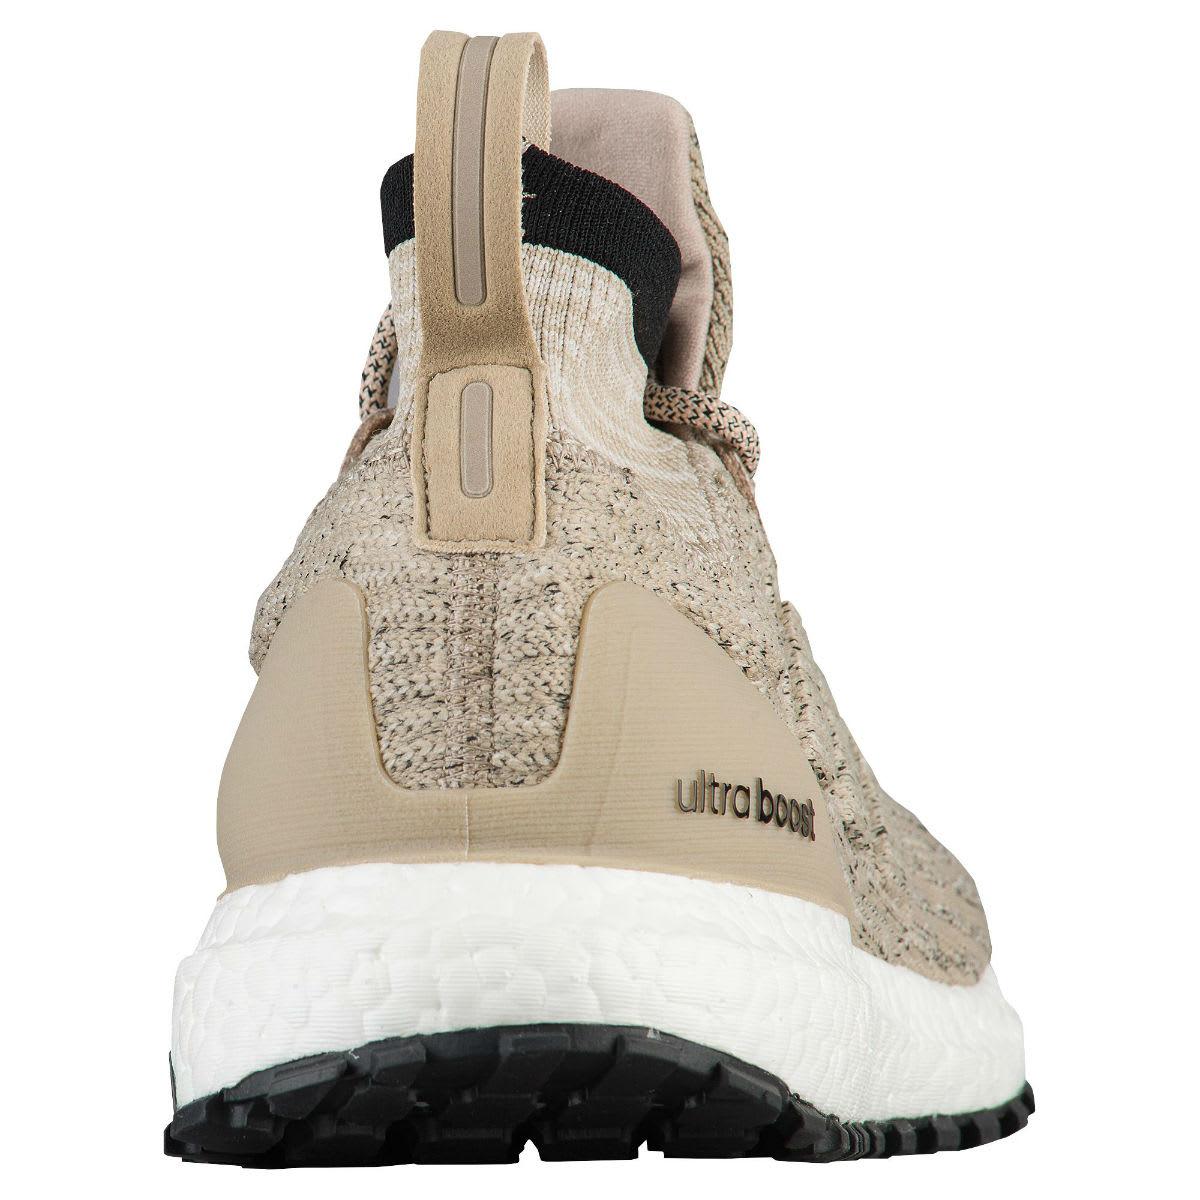 689965af5311 ... 50% off adidas ultra boost atr mid trace khaki release date heel cg3001  197bc 9f085